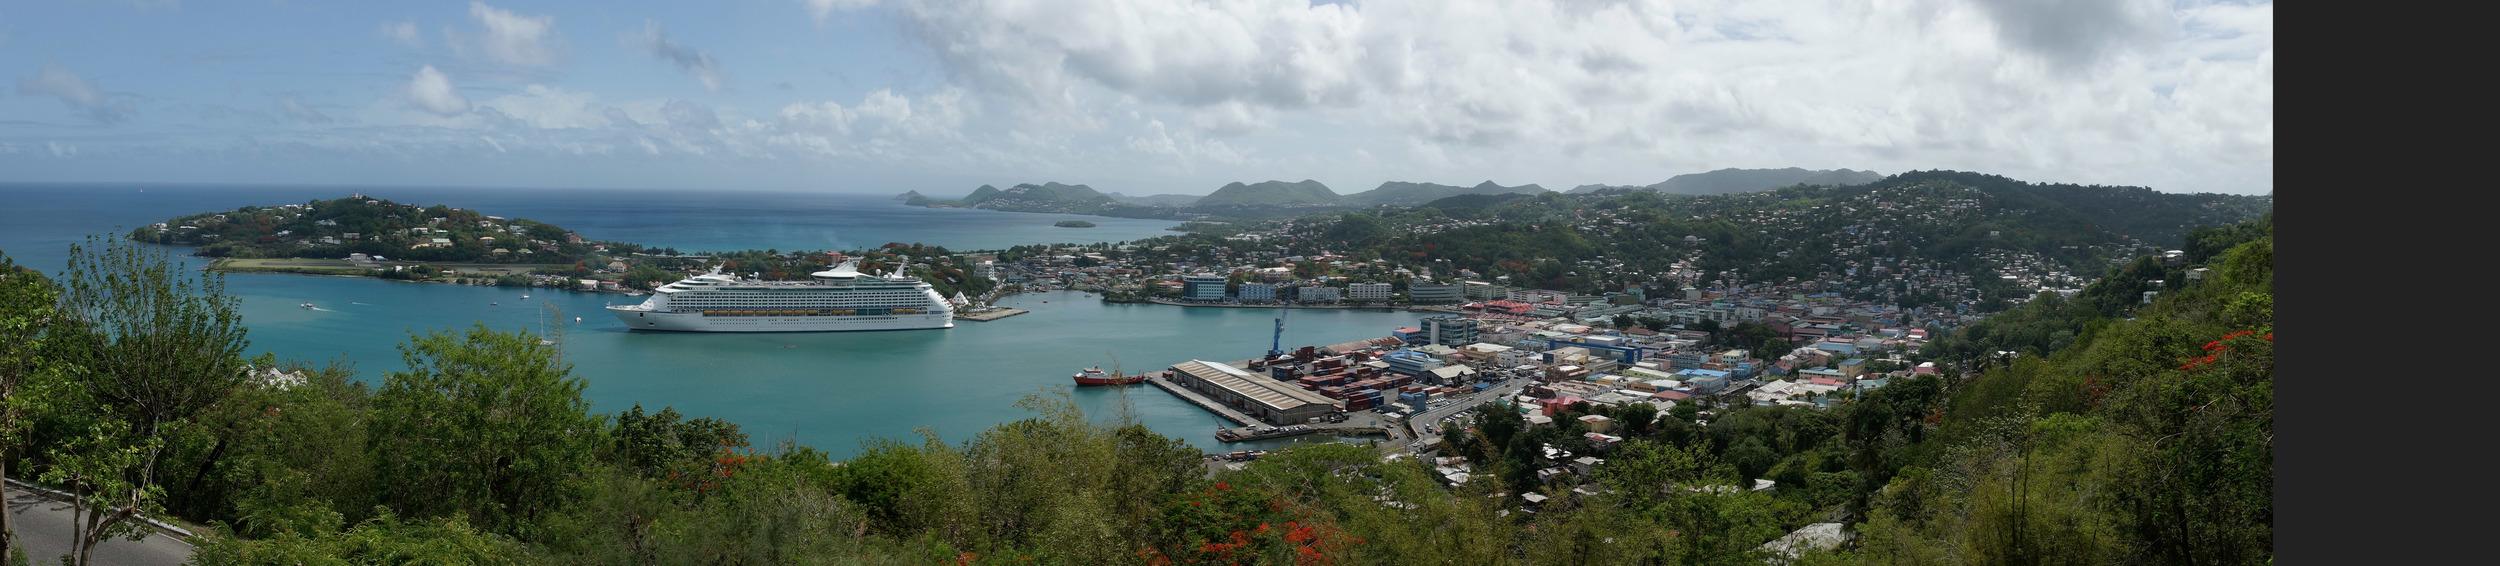 Carribean Cruise-558.jpg